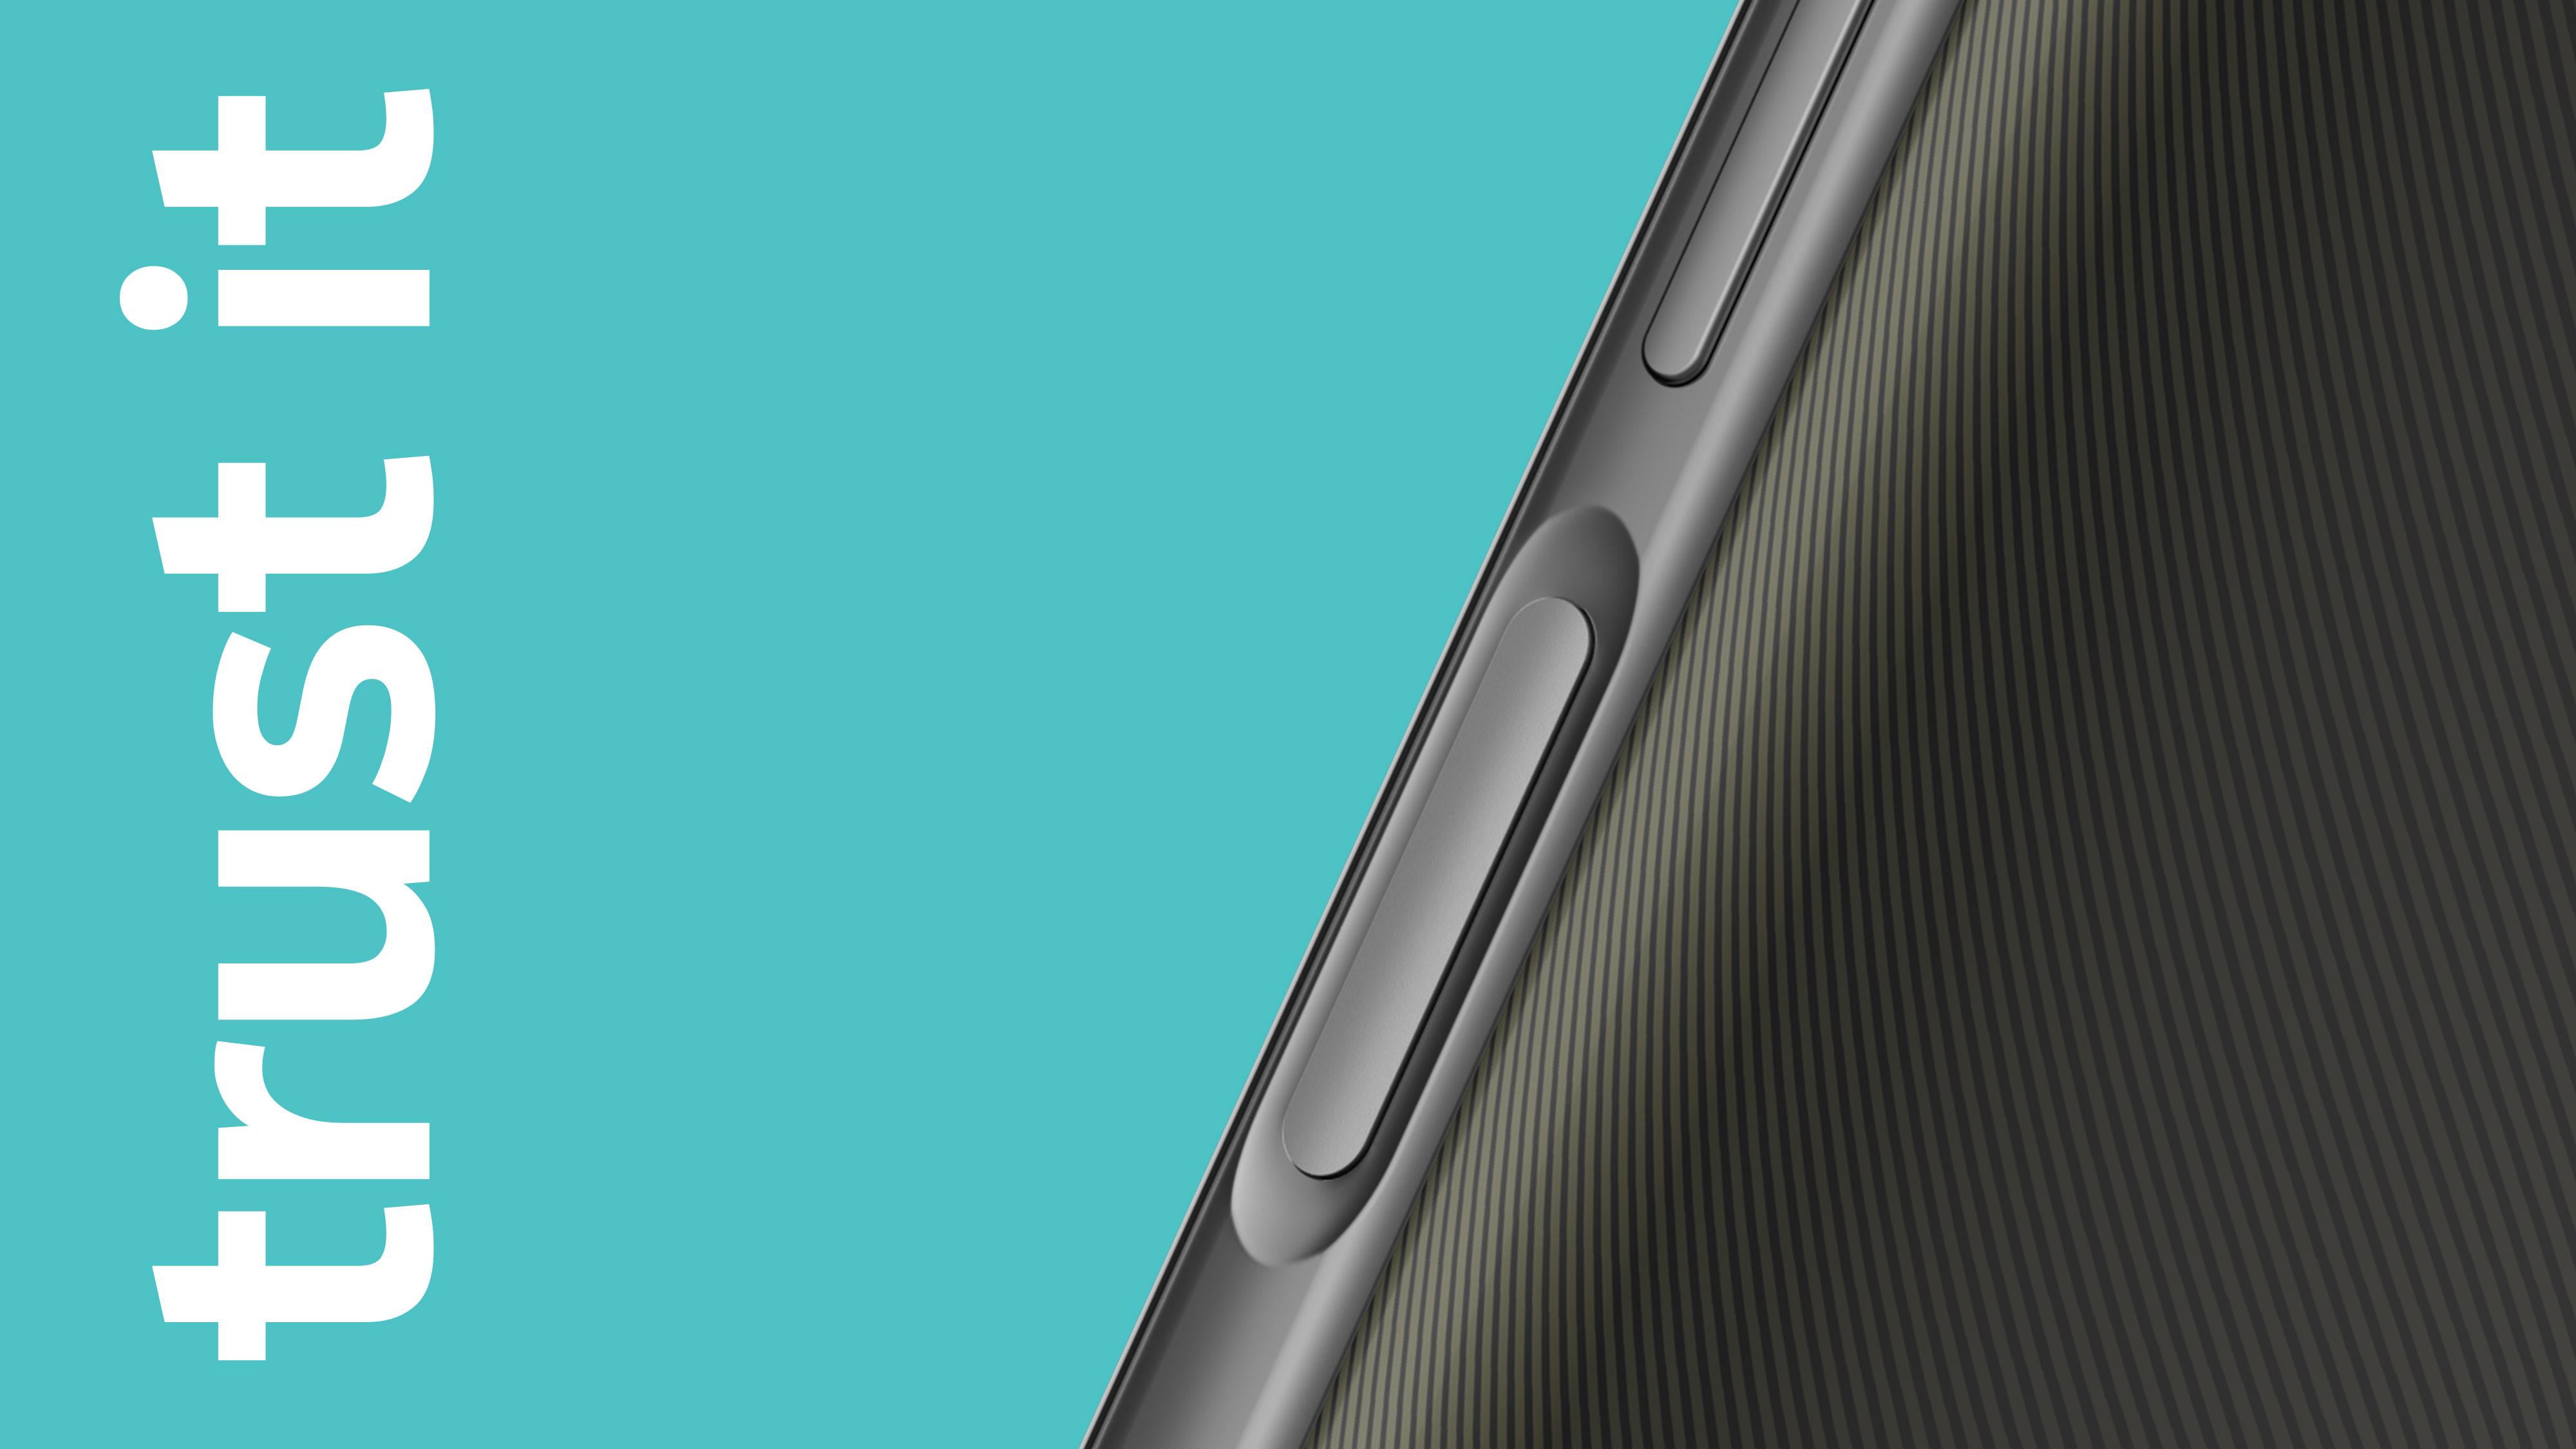 Close-up of the fingerprint sensor on Nokia G300